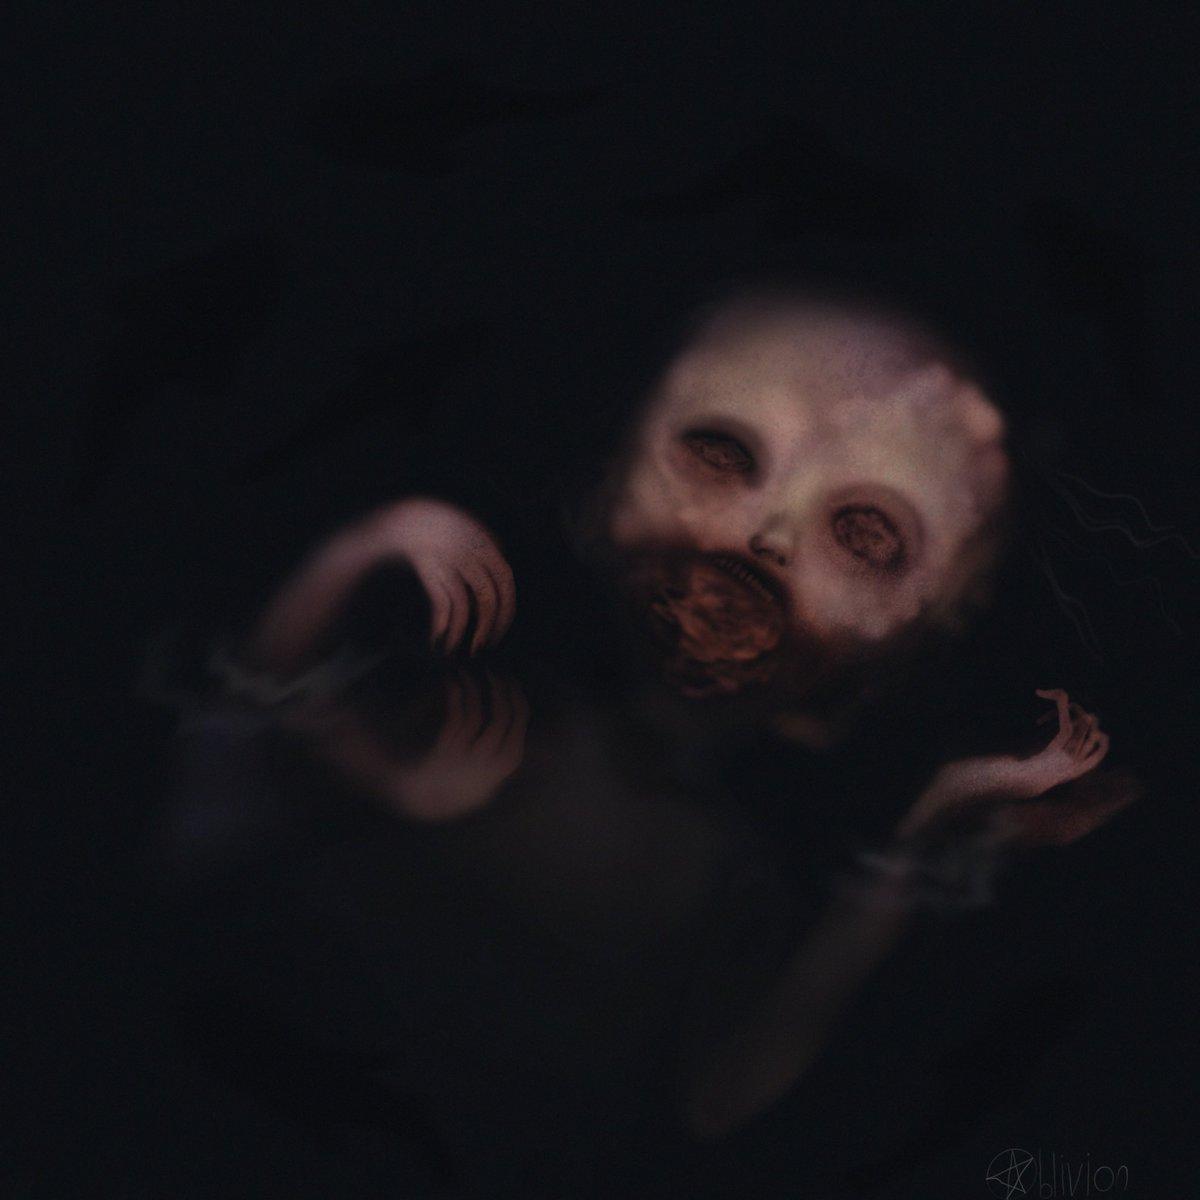 Hello! I'm Enoch, I doodle things of the spooky variety. INSTA:Instagram.com/Odd0blivion ETSY: etsy.me/2PQIiOW PRINTS vvv INPRNT:inprnt.com/gallery/oddobl…